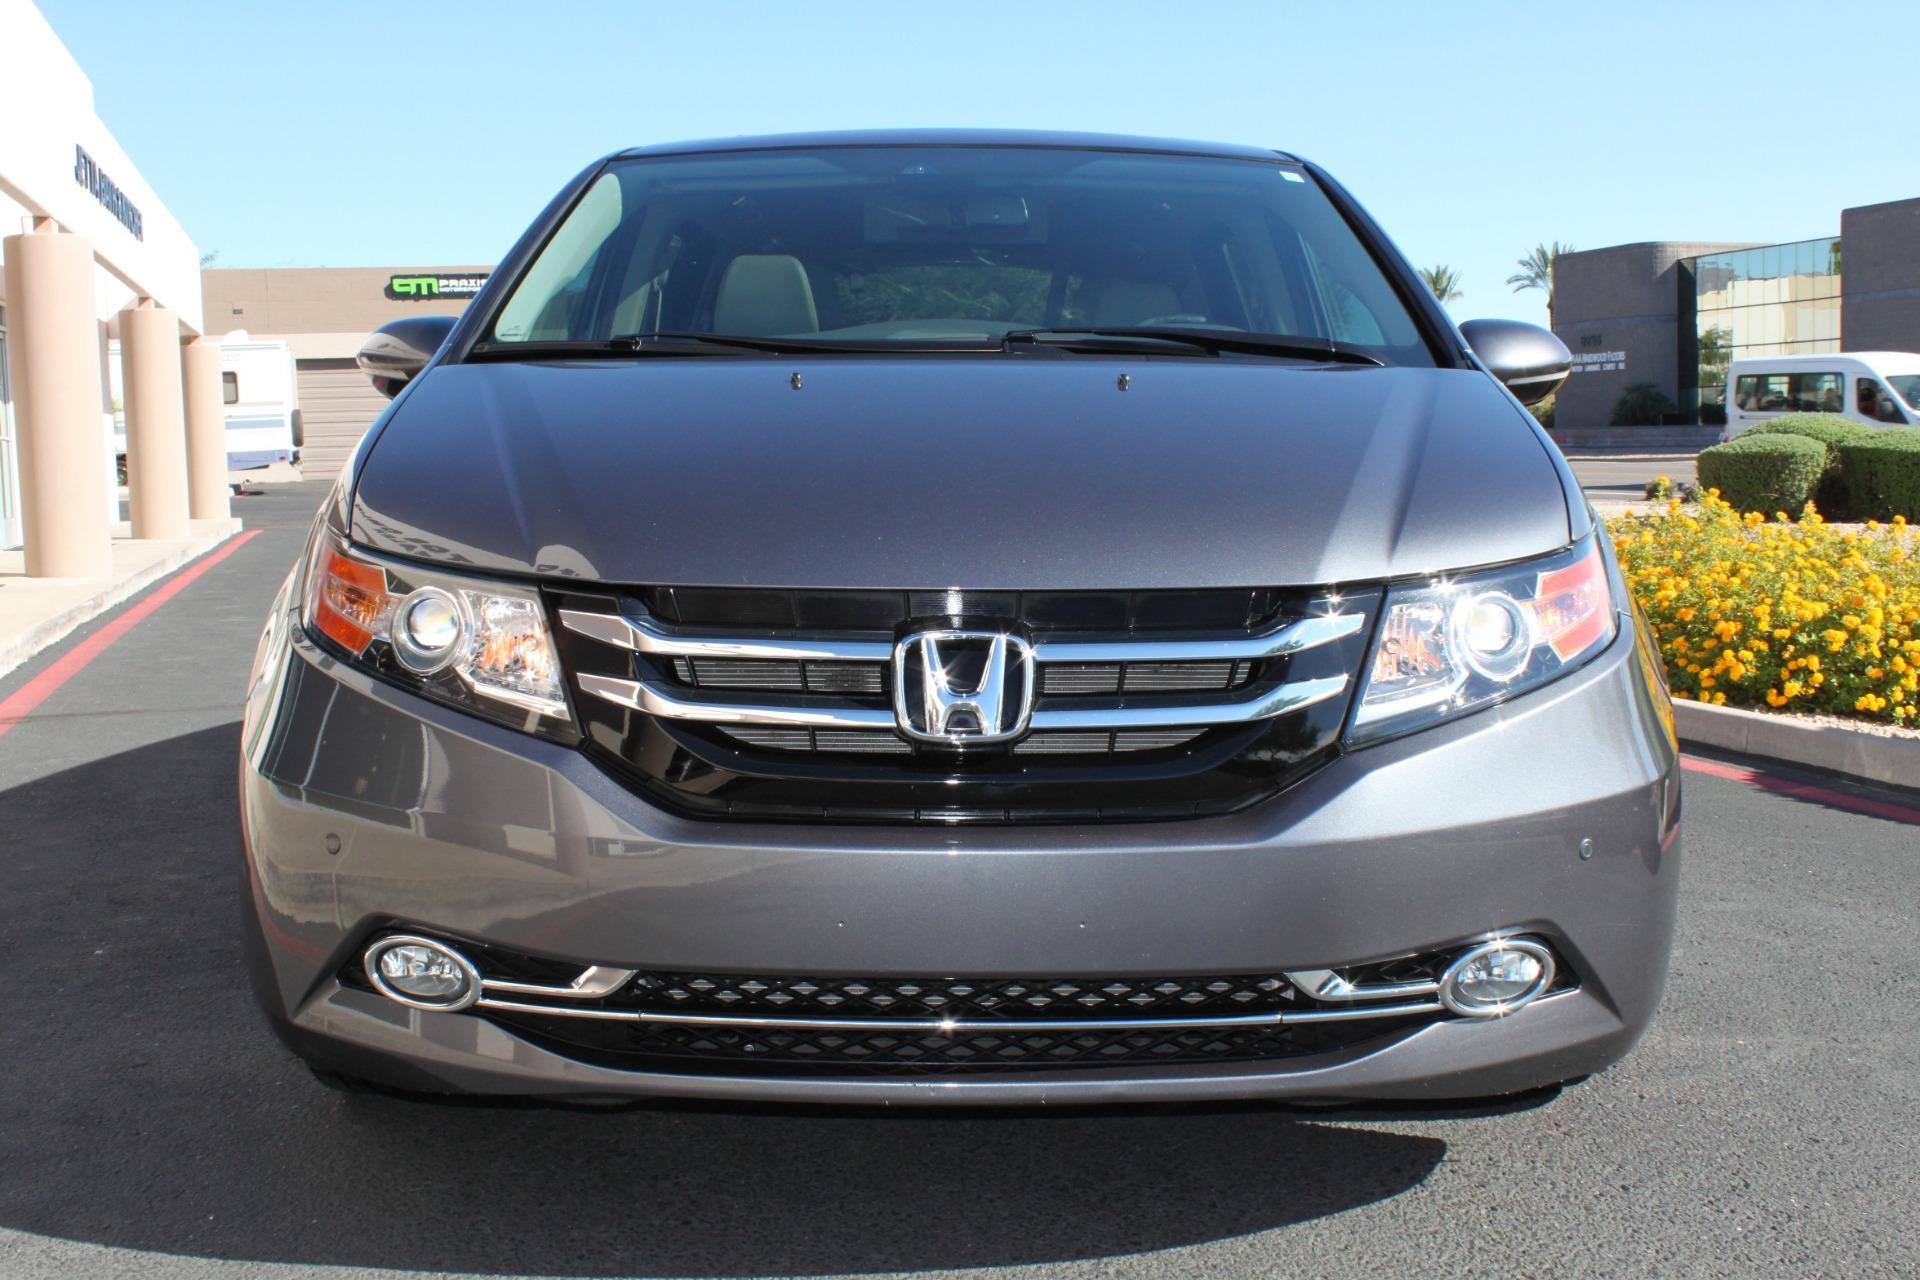 Used-2016-Honda-Odyssey-Touring-Elite-Wrangler